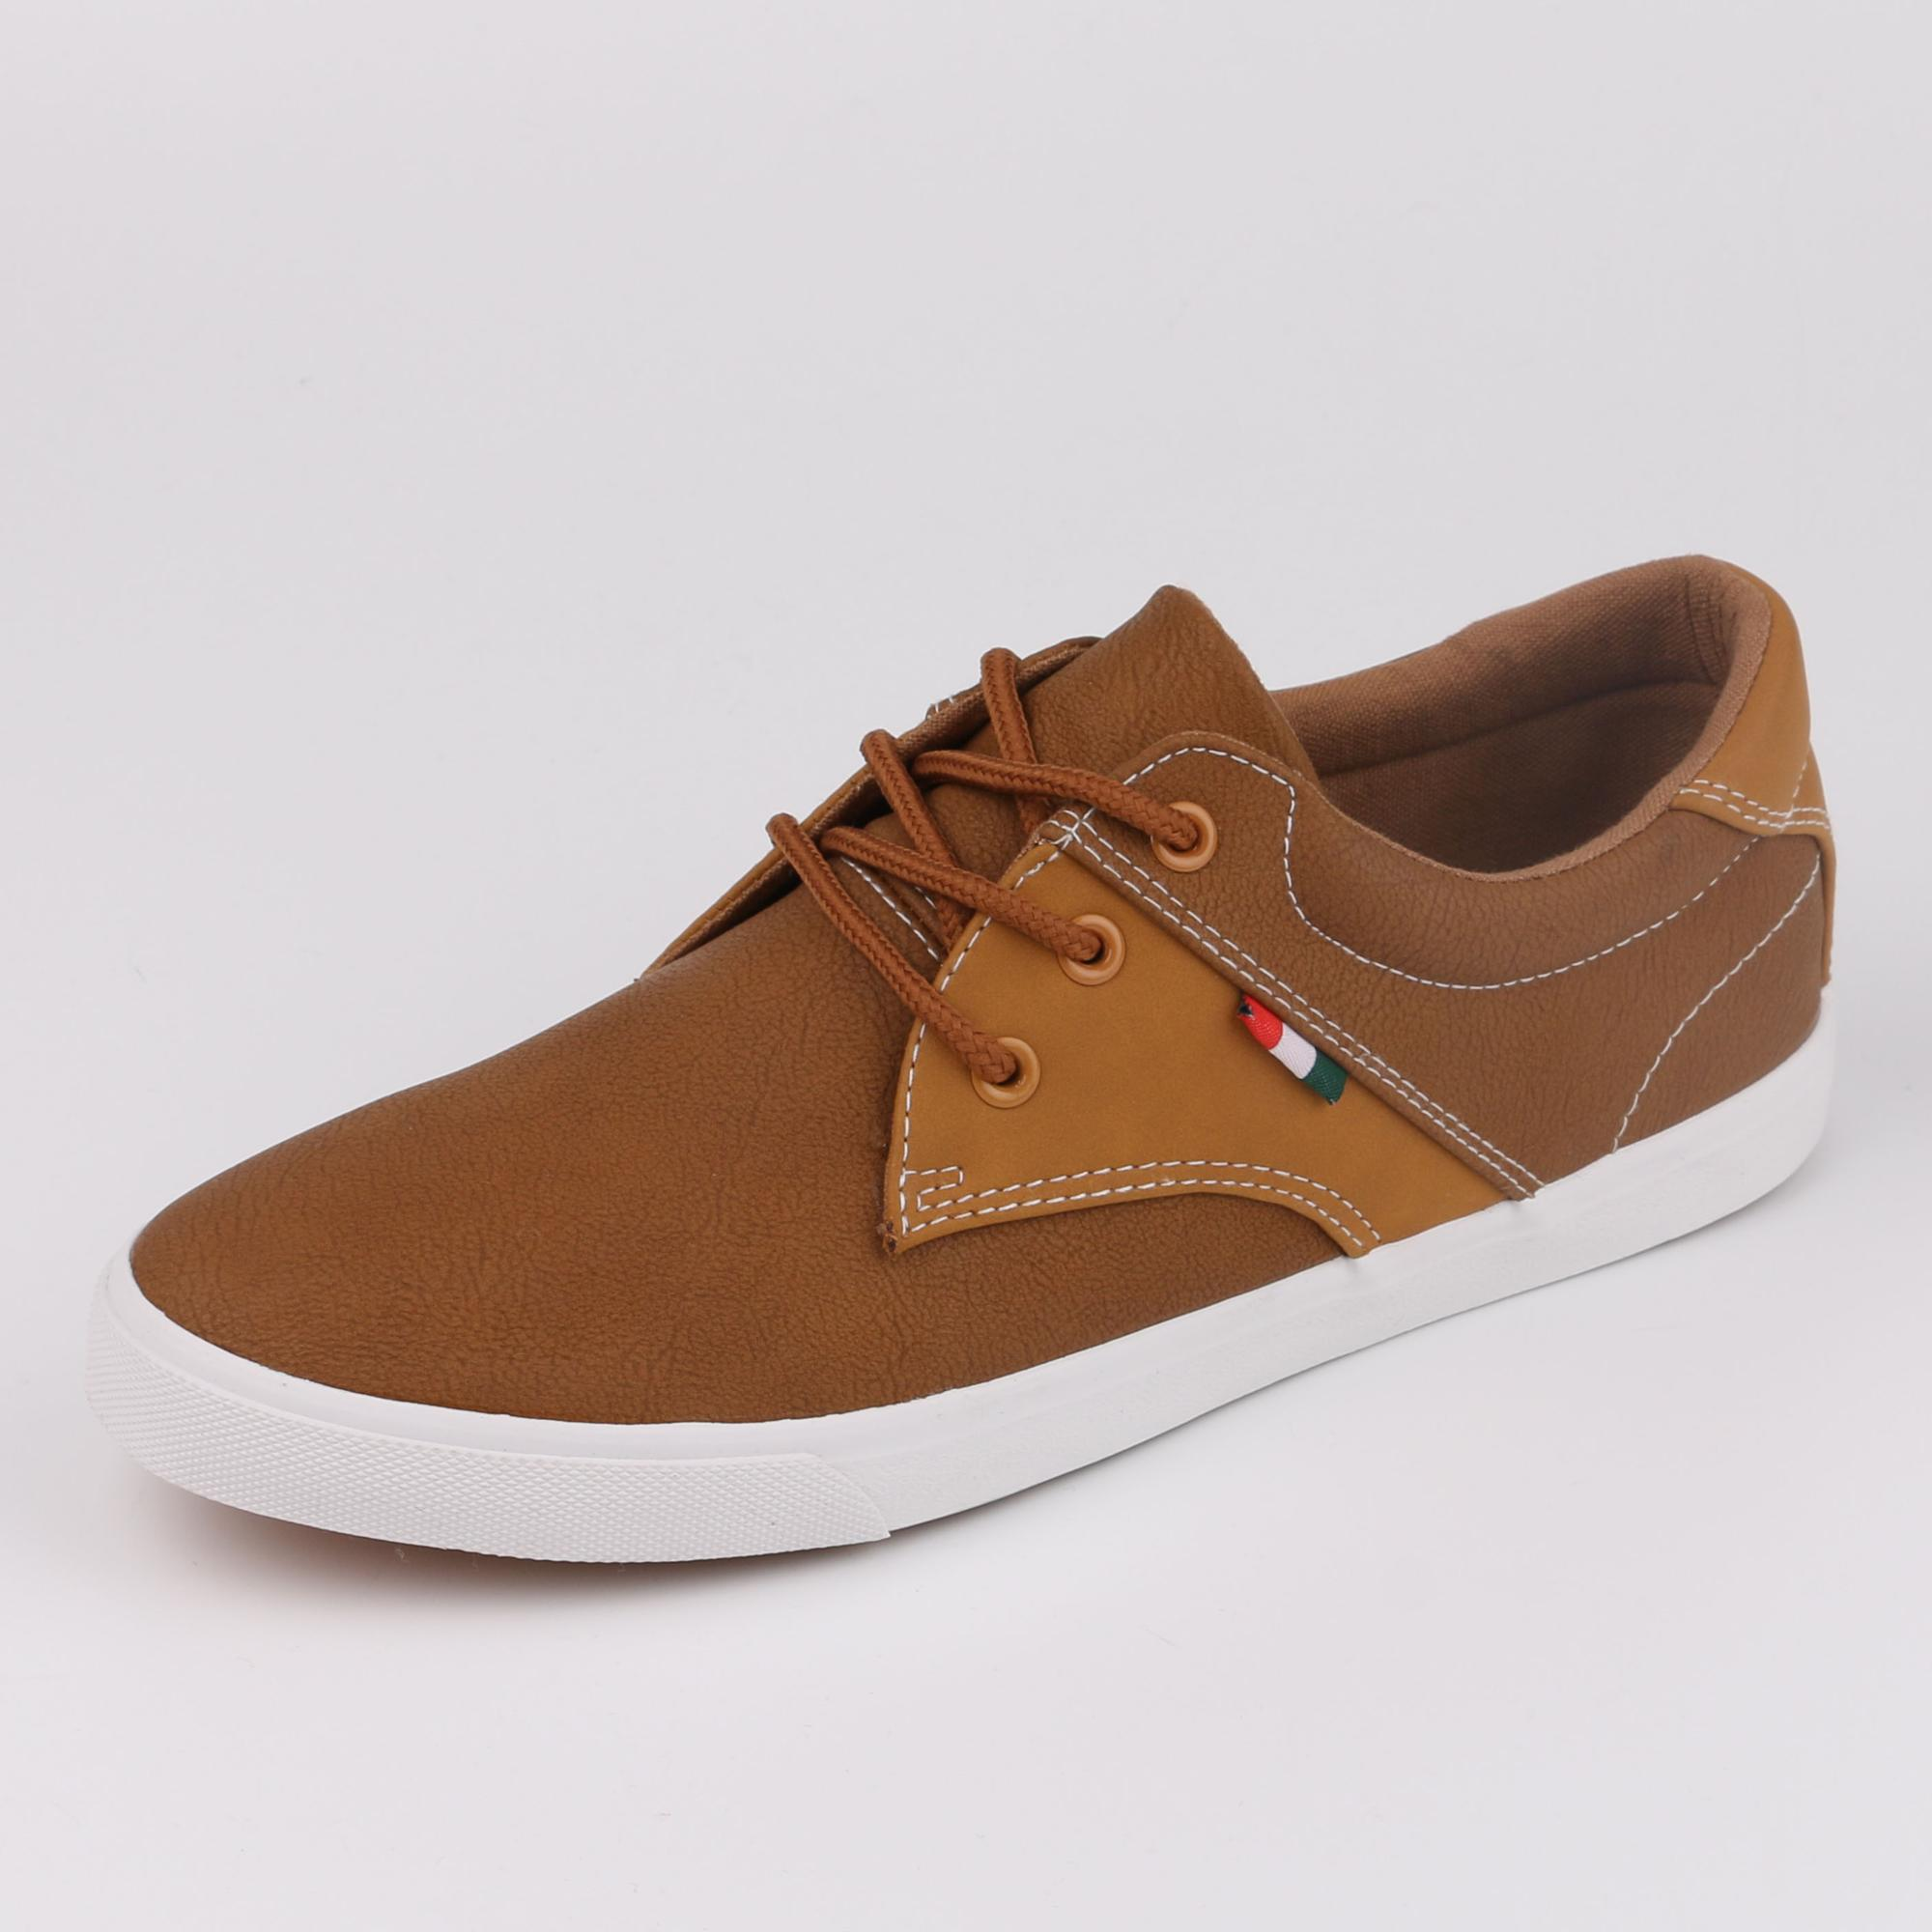 camel shoes aliexpress francais europeenne assurances 690300